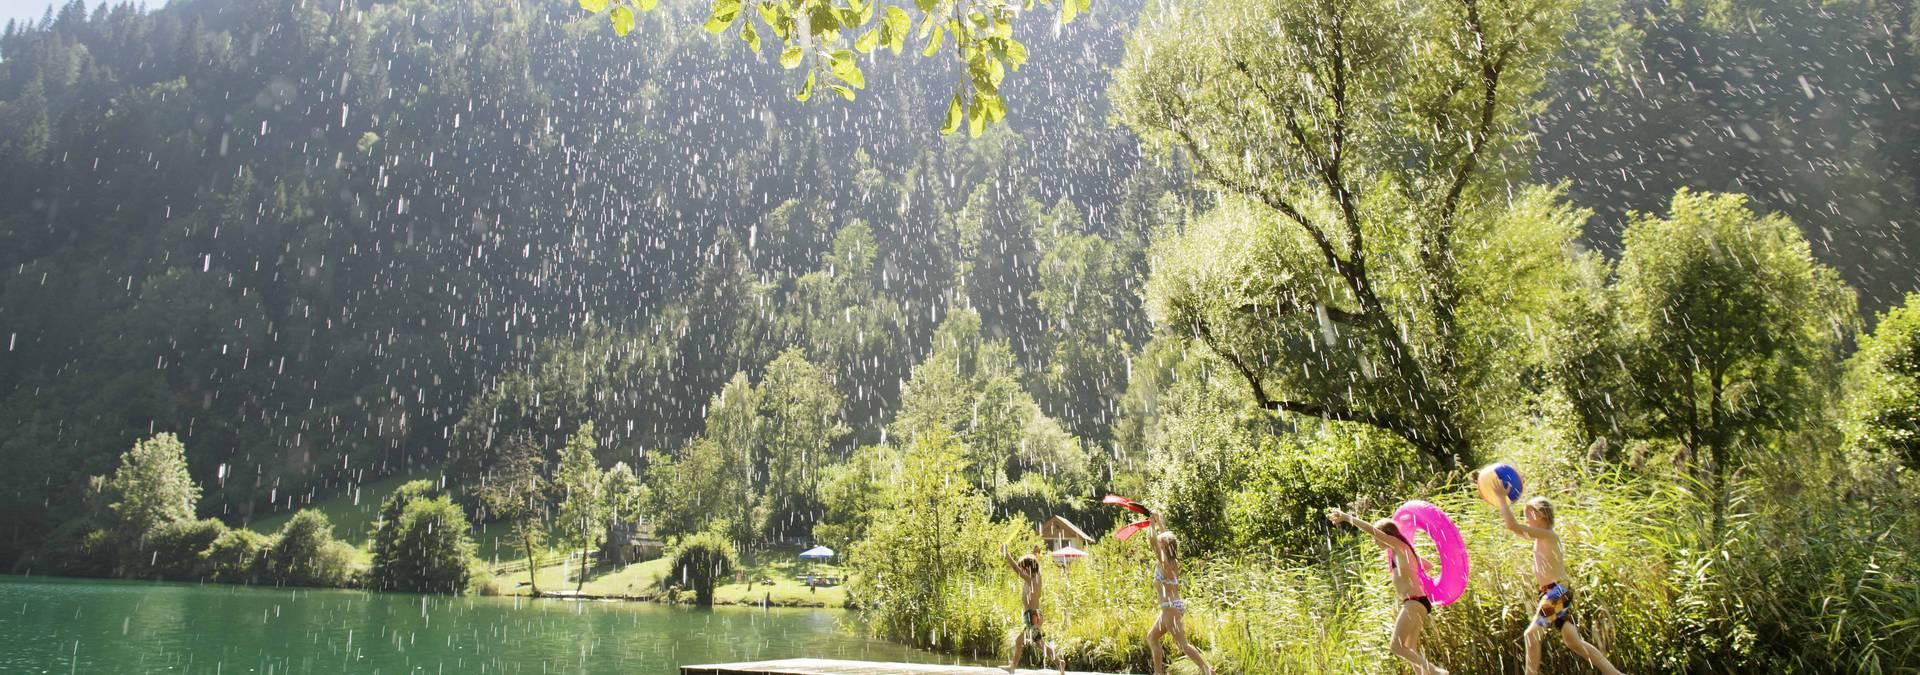 Afritzer See Sommerregen